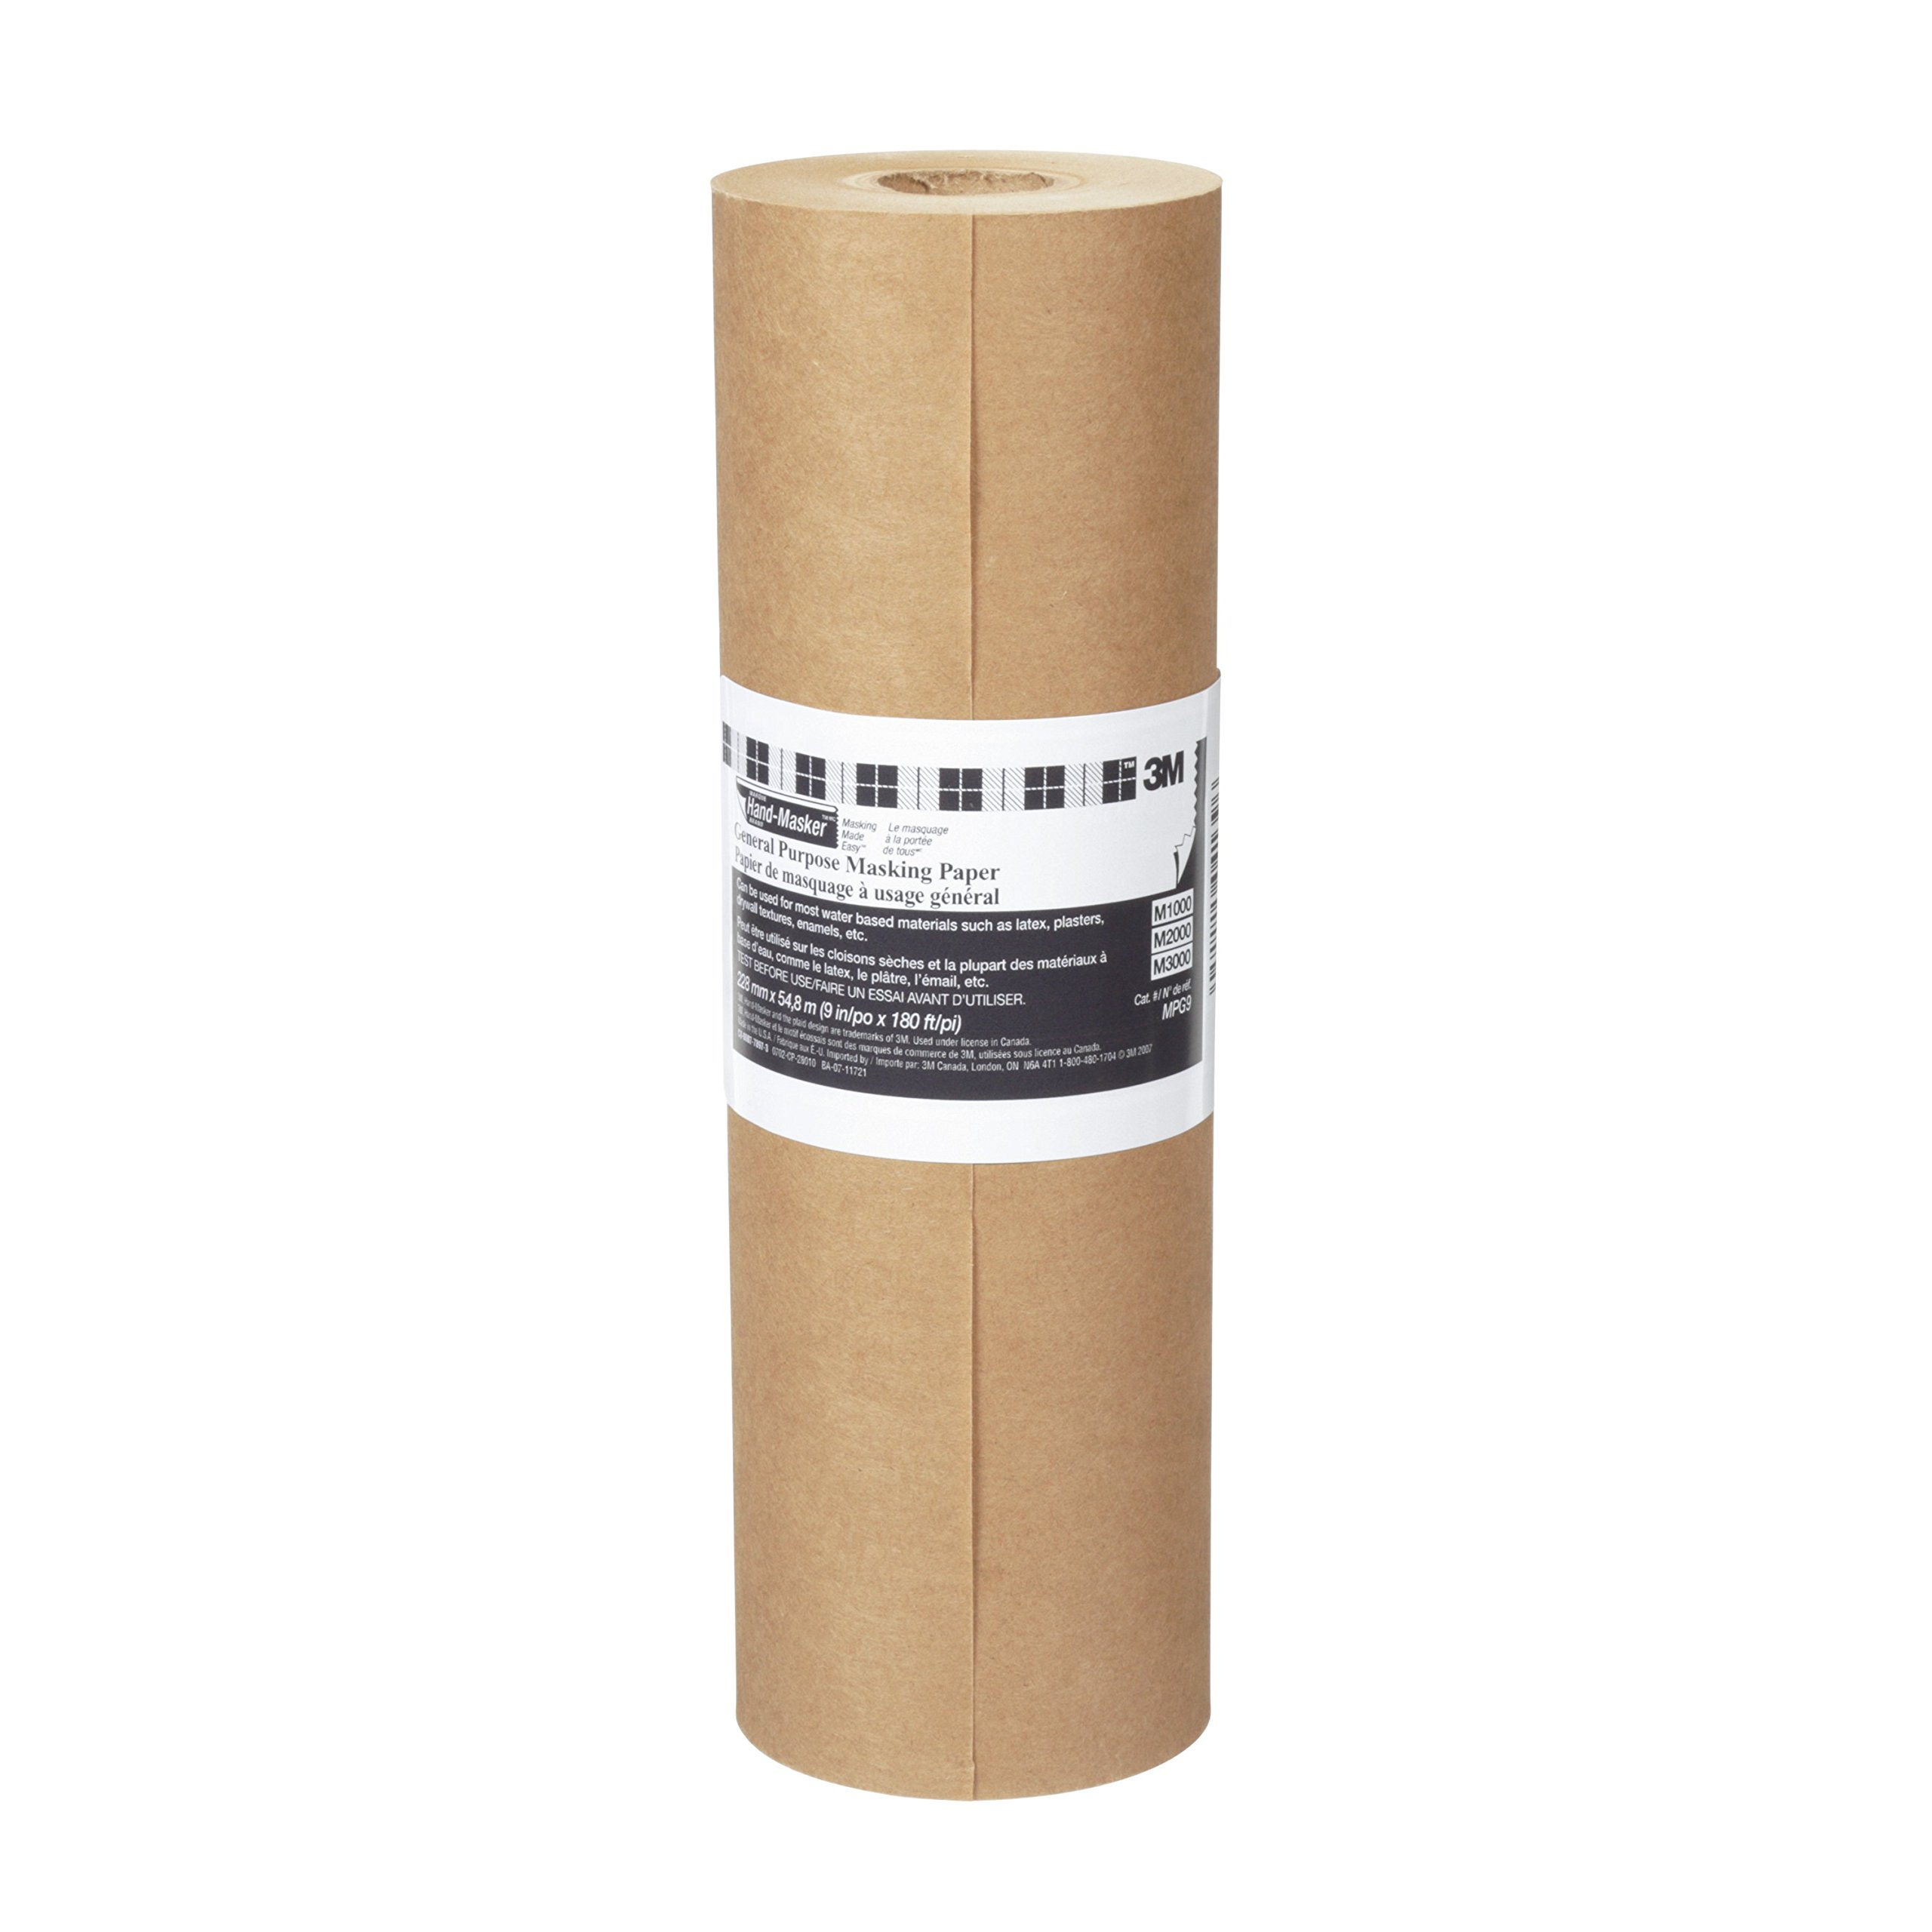 MPG18 3M Hand-Masker General Purpose Masking Paper, 18-Inch x 60-Yard